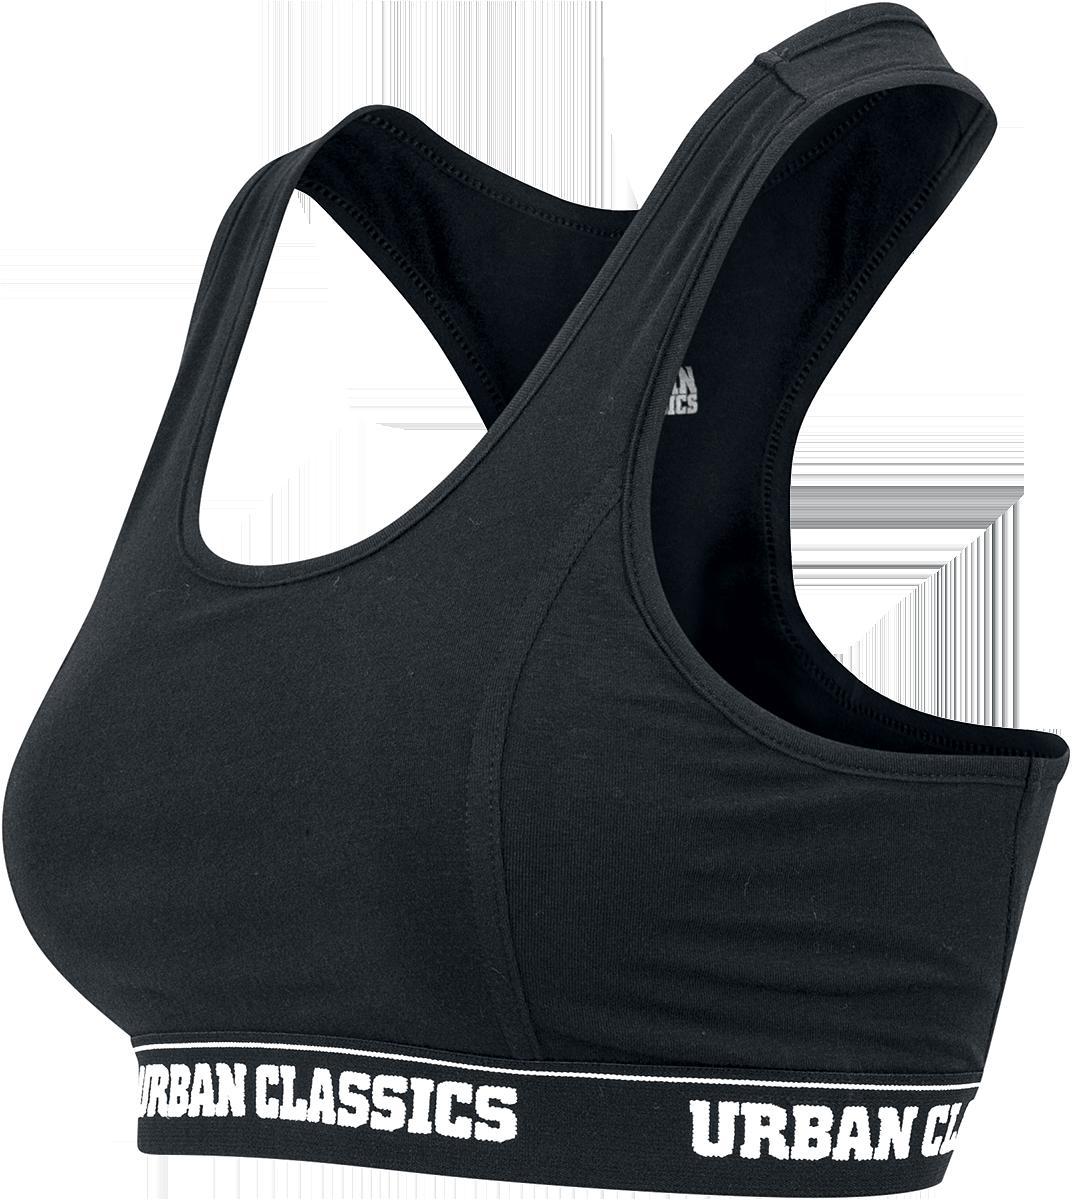 Image of Urban Classics Ladies Logo Bra Bustier schwarz